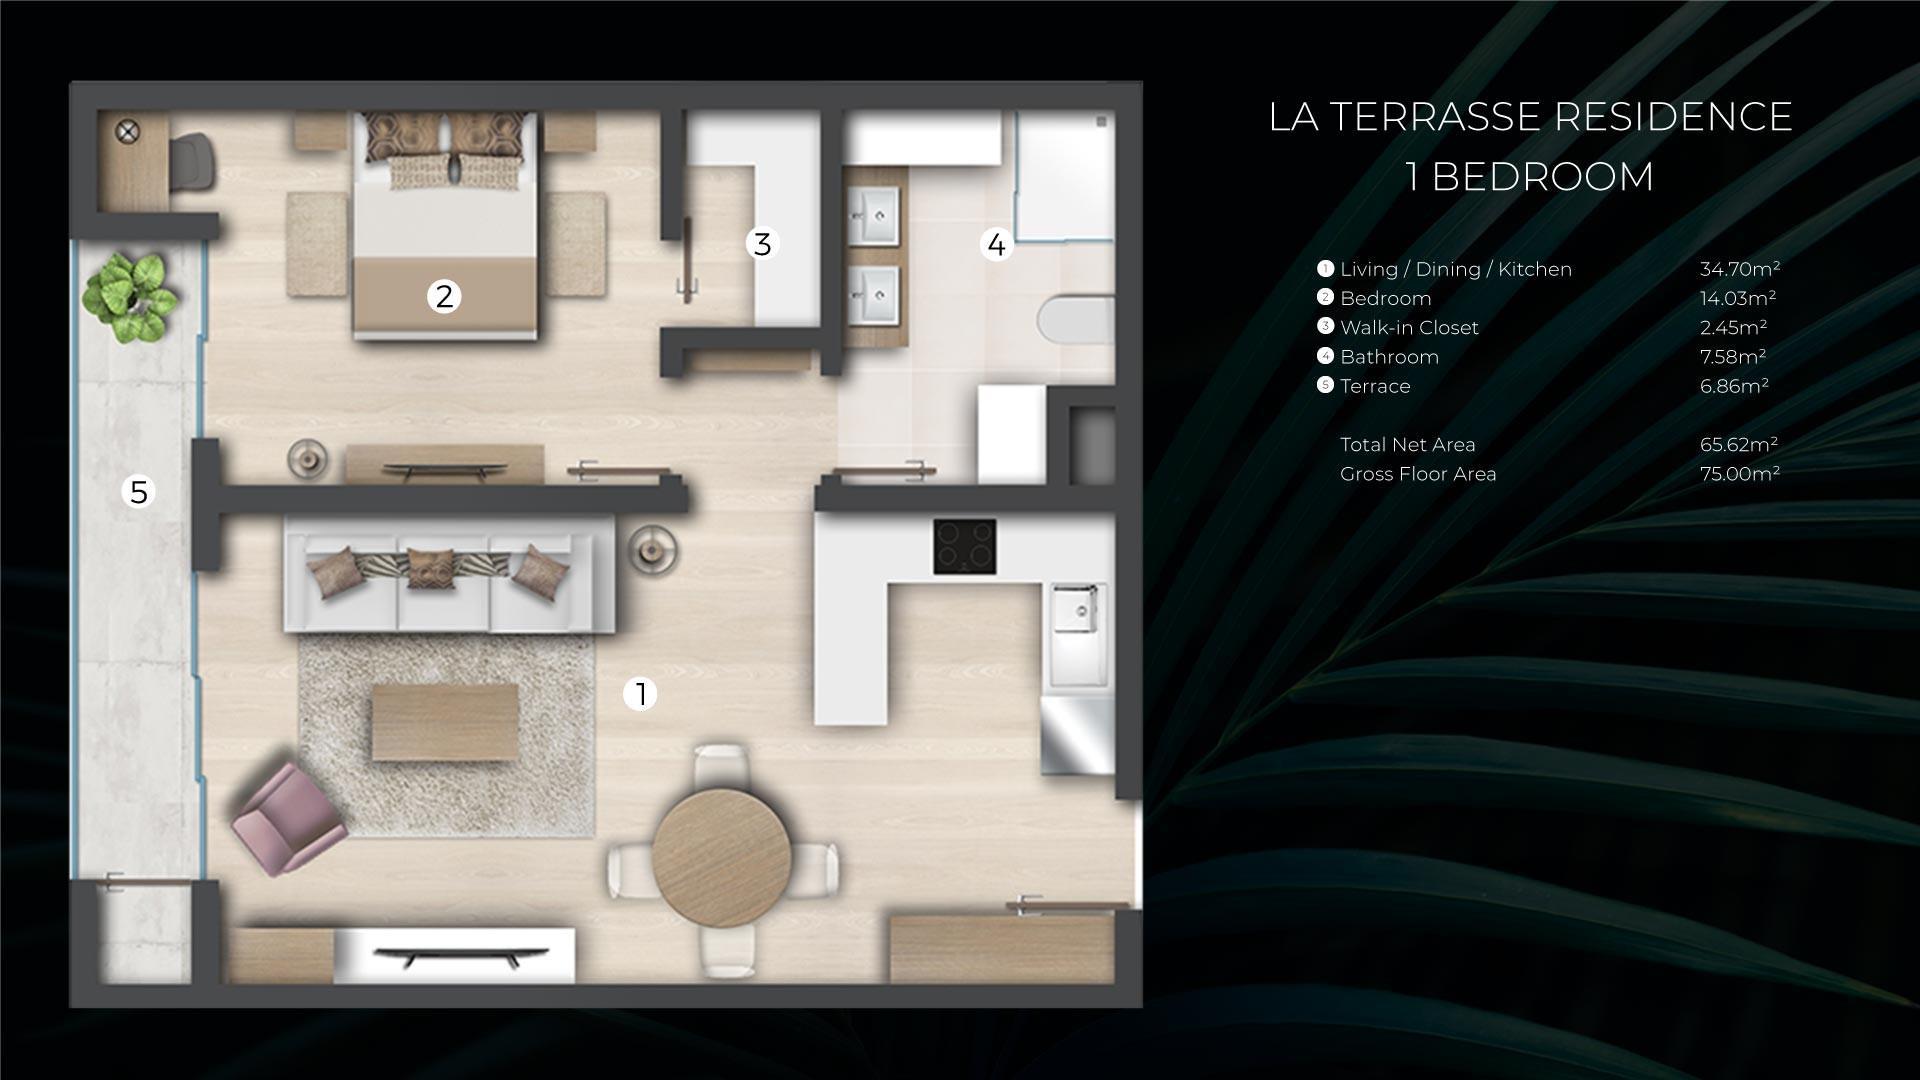 1 Bedroom Apartment / Flat For Sale in Cap Malheureux